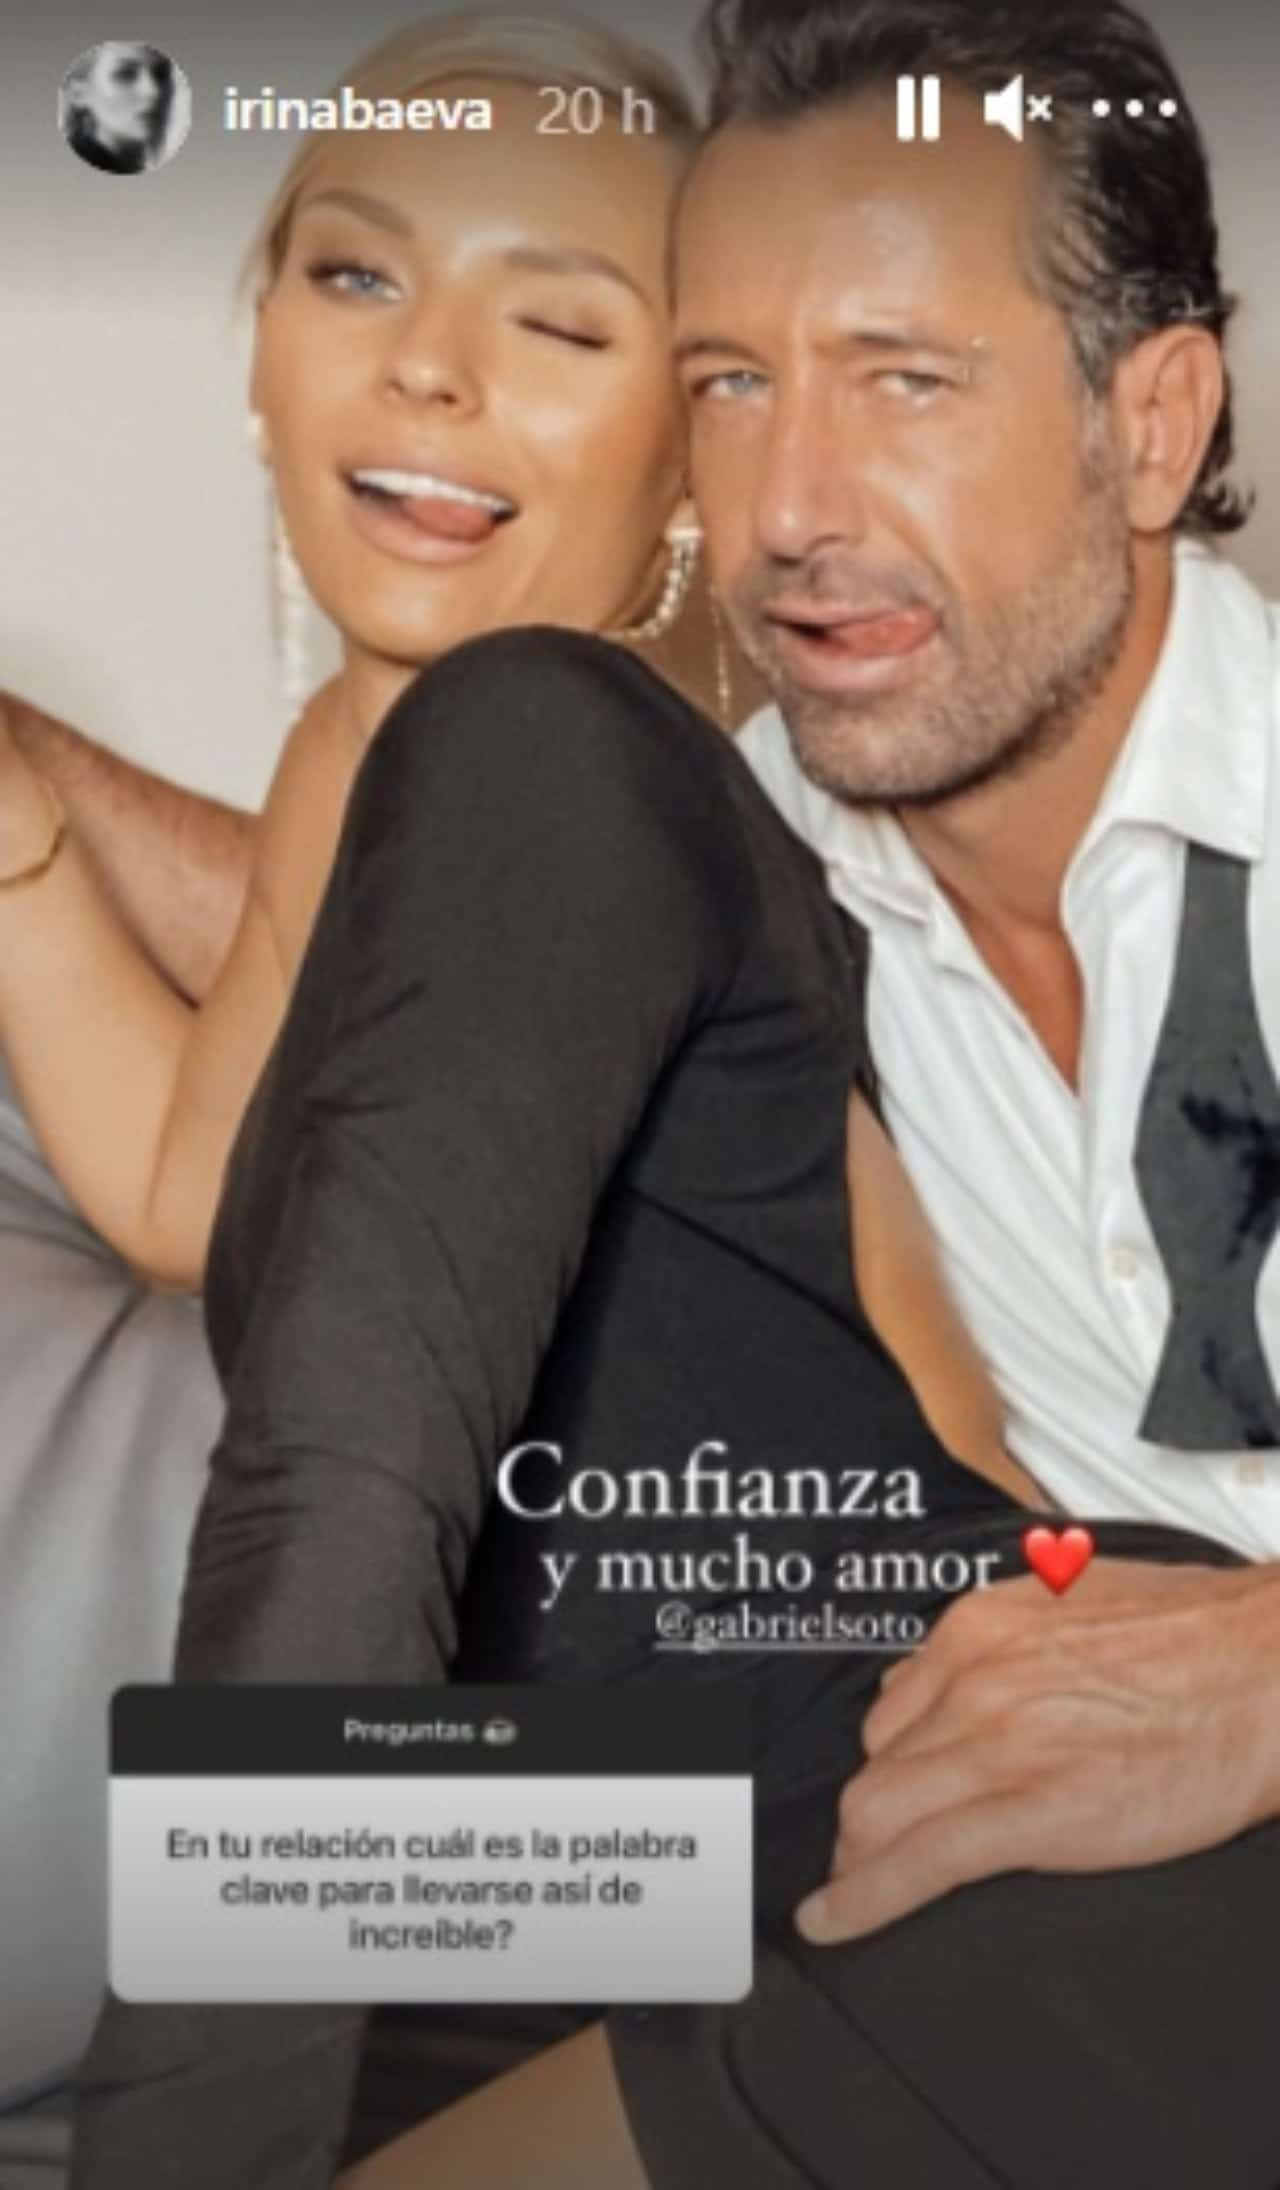 Irina Baeva abranzada a Gabriel Soto